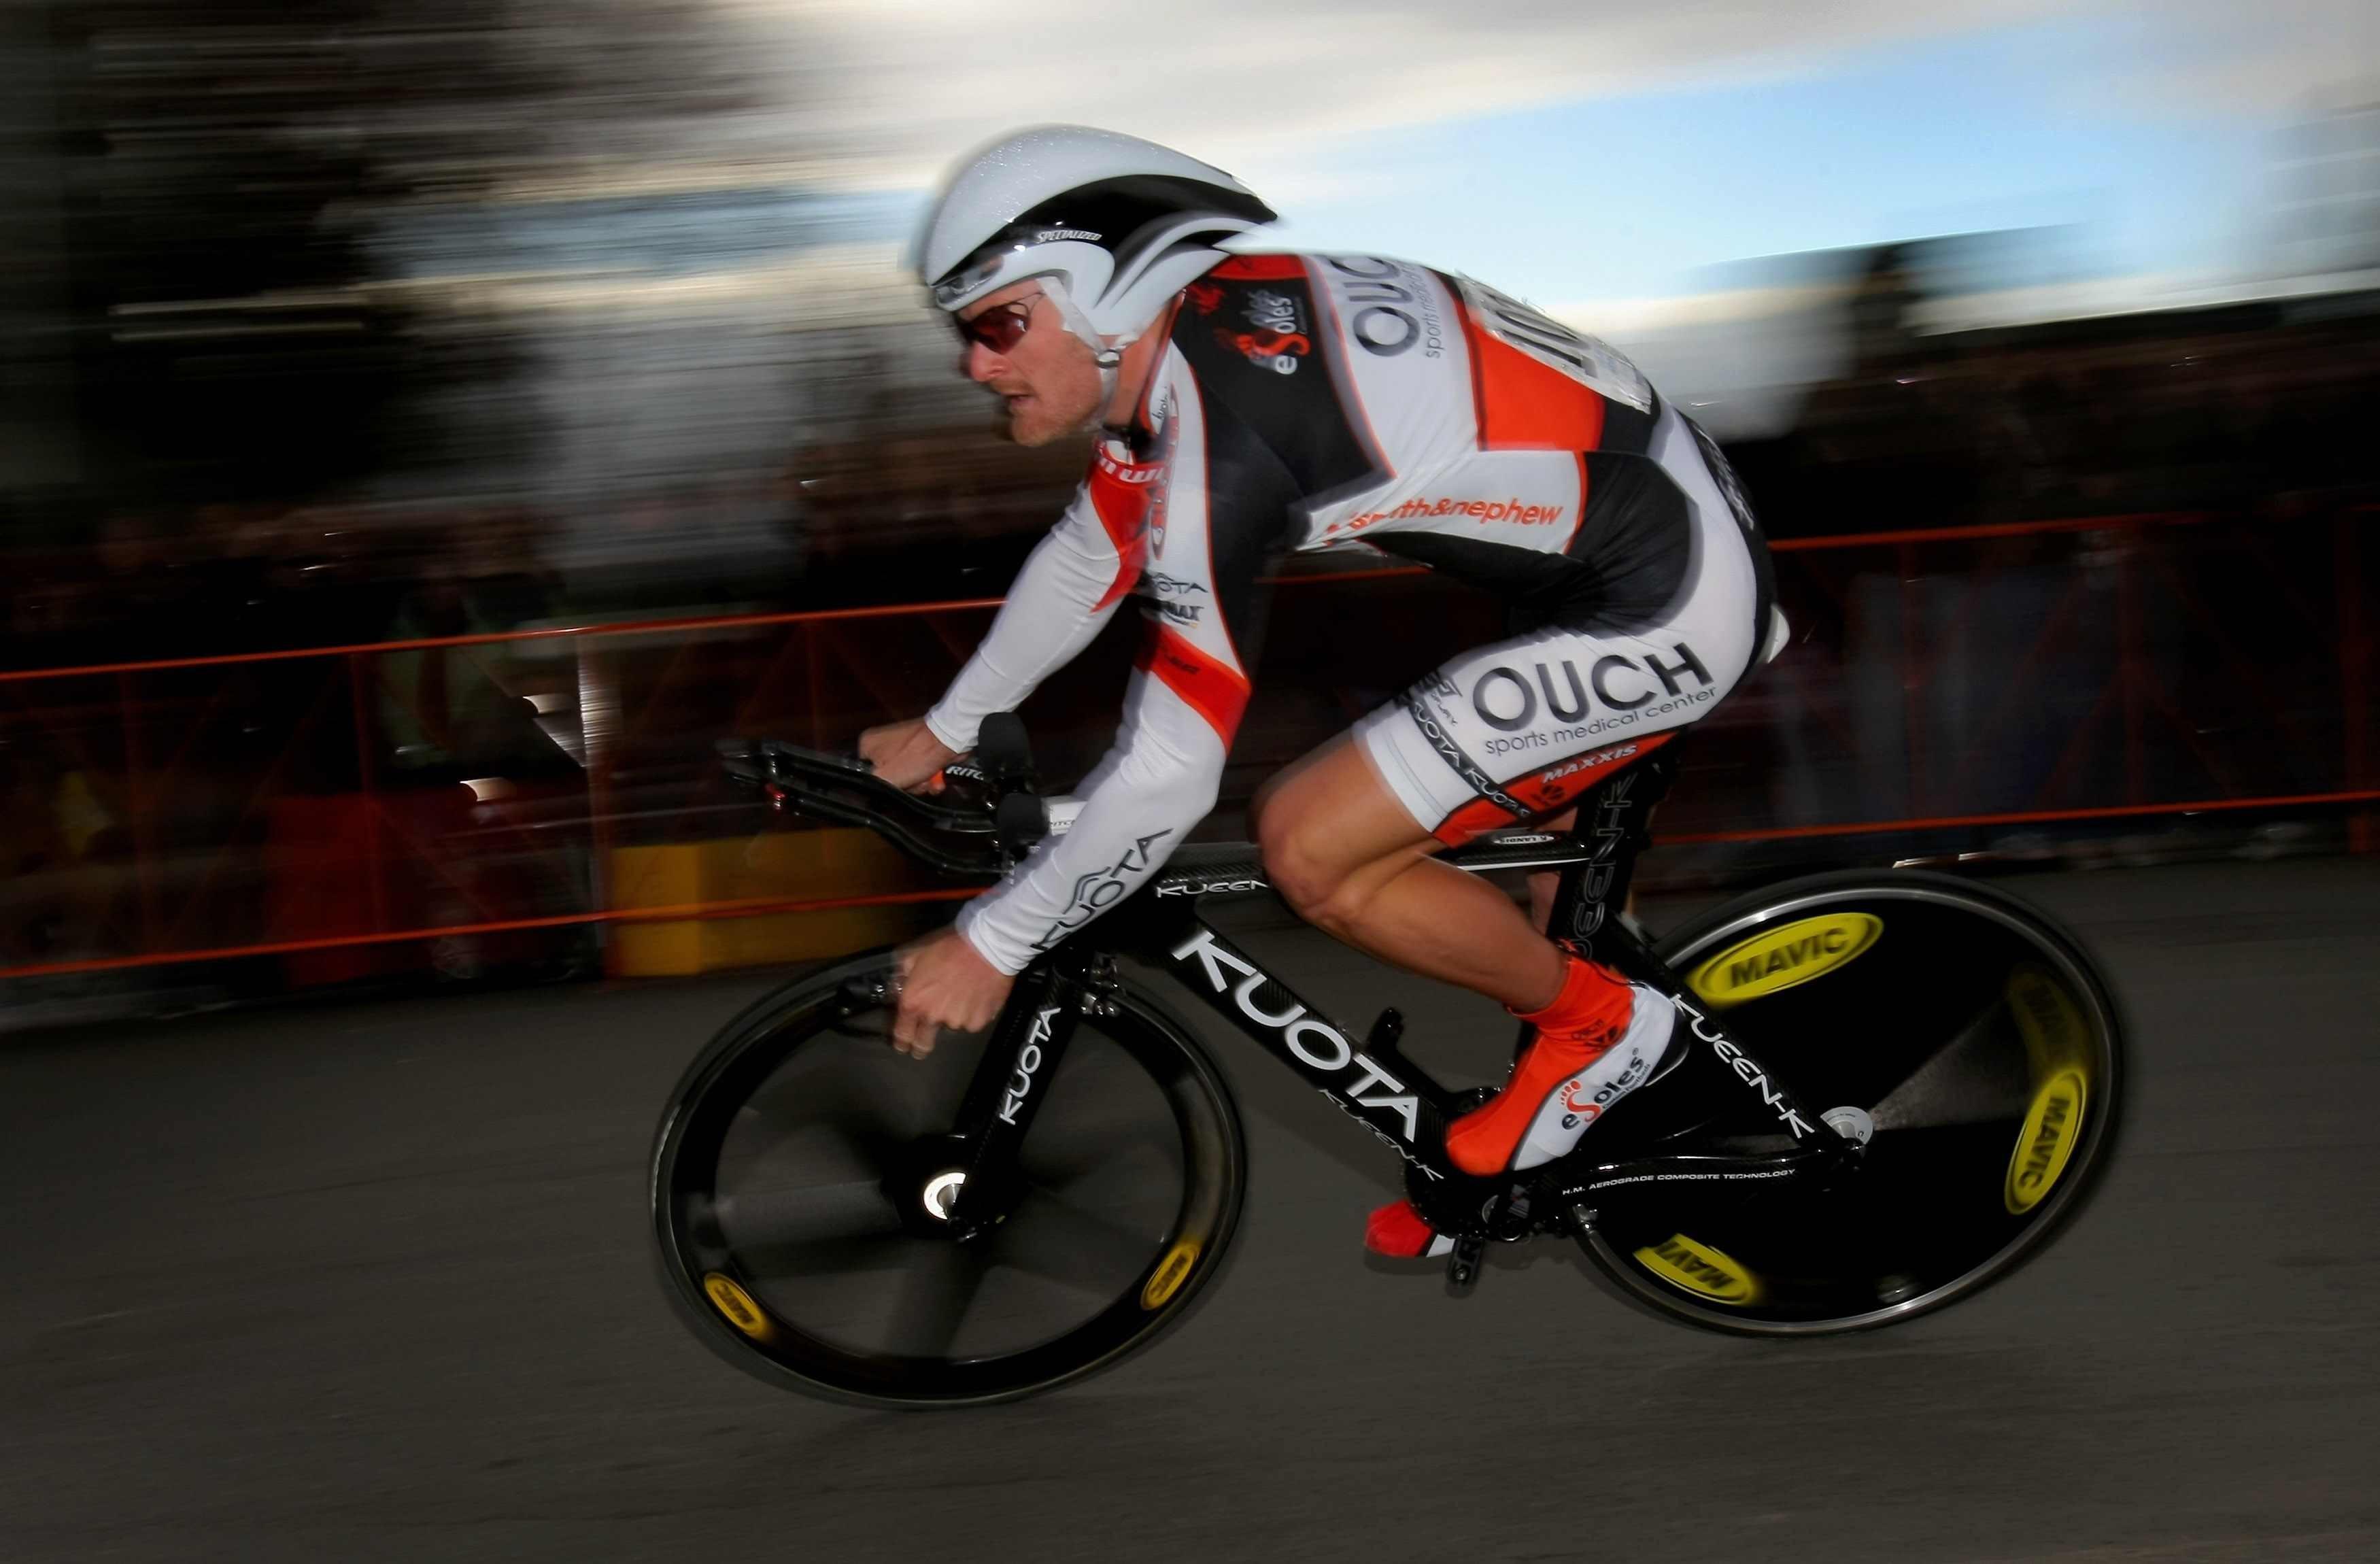 Landis racing the Tour of California prologue February 14, 2009.